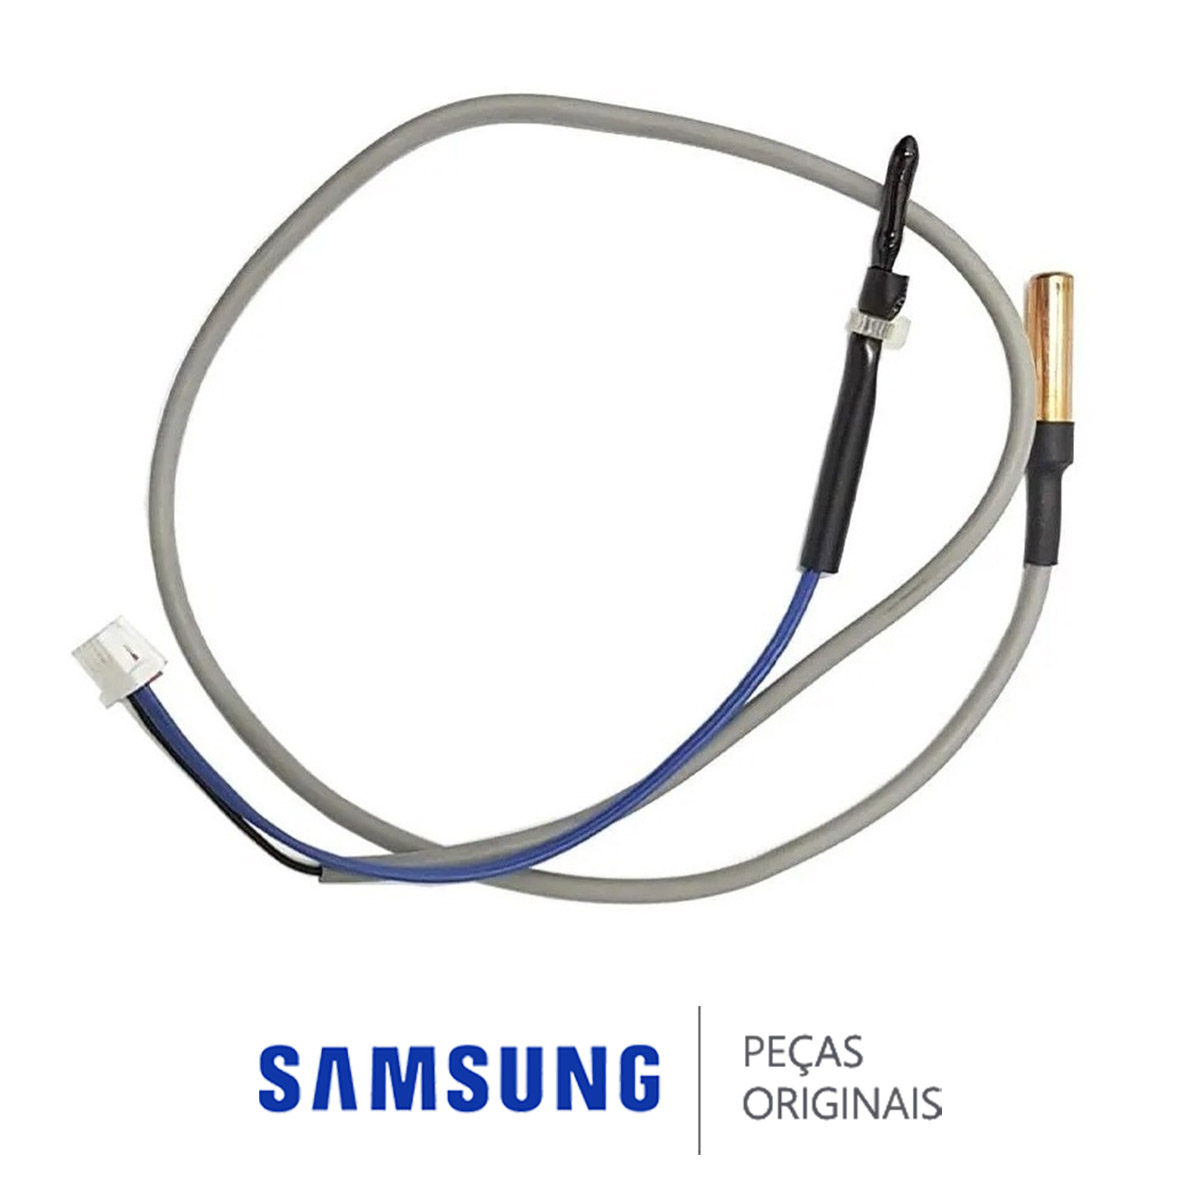 Sensor de Temperatura e Degelo da Evaporadora Ar Condicionado Samsung 9.000 a 24.000 BTUS